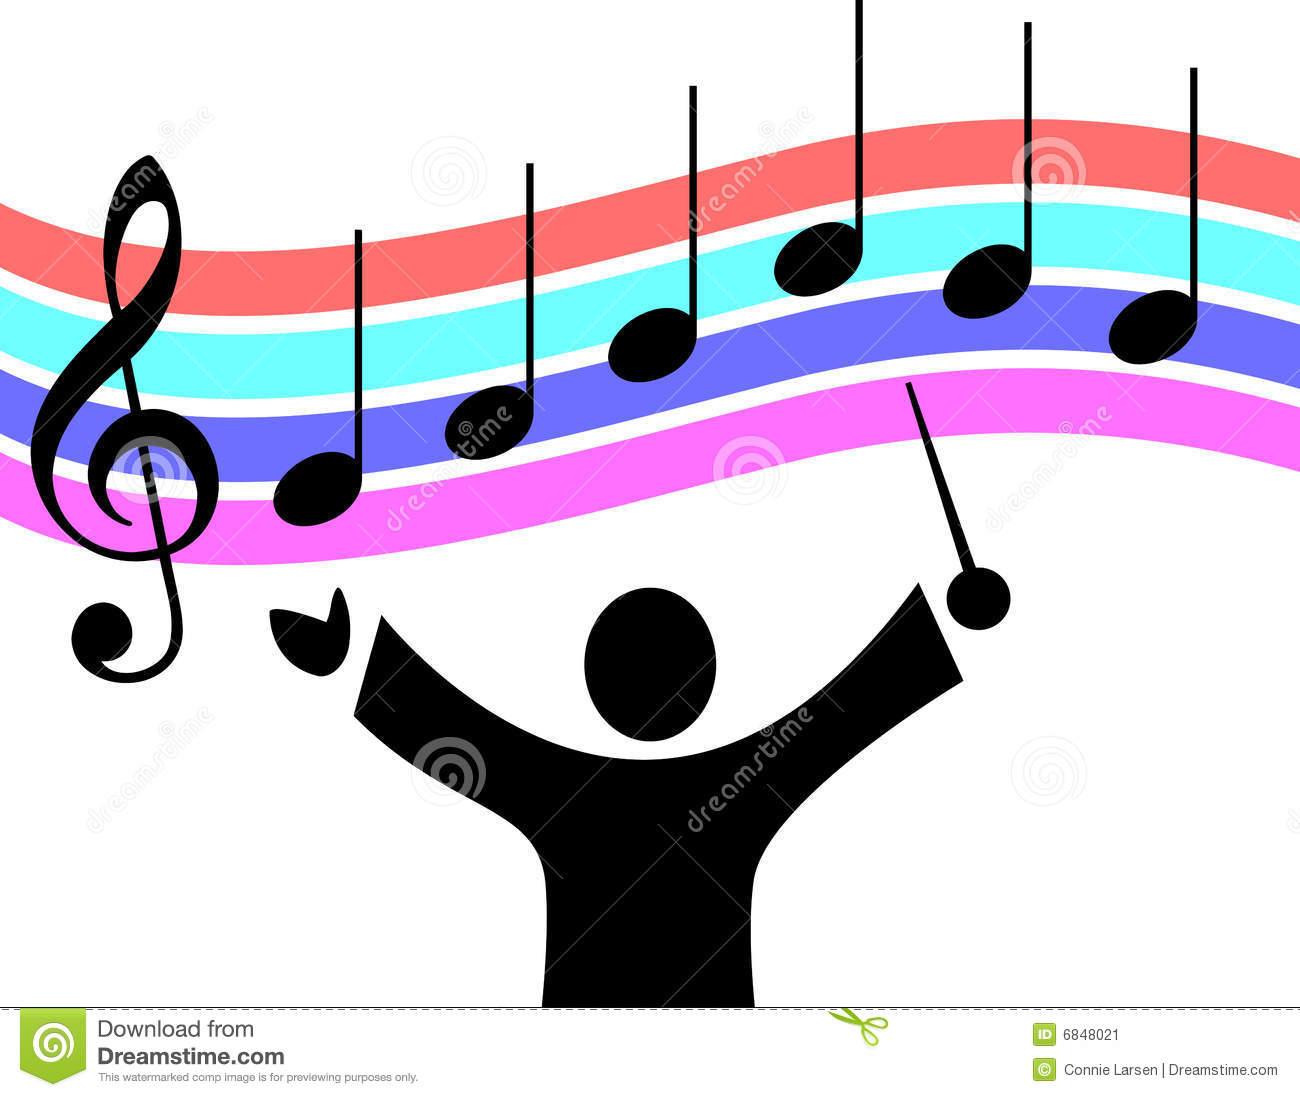 Musician clipart musical director, Musician musical director.